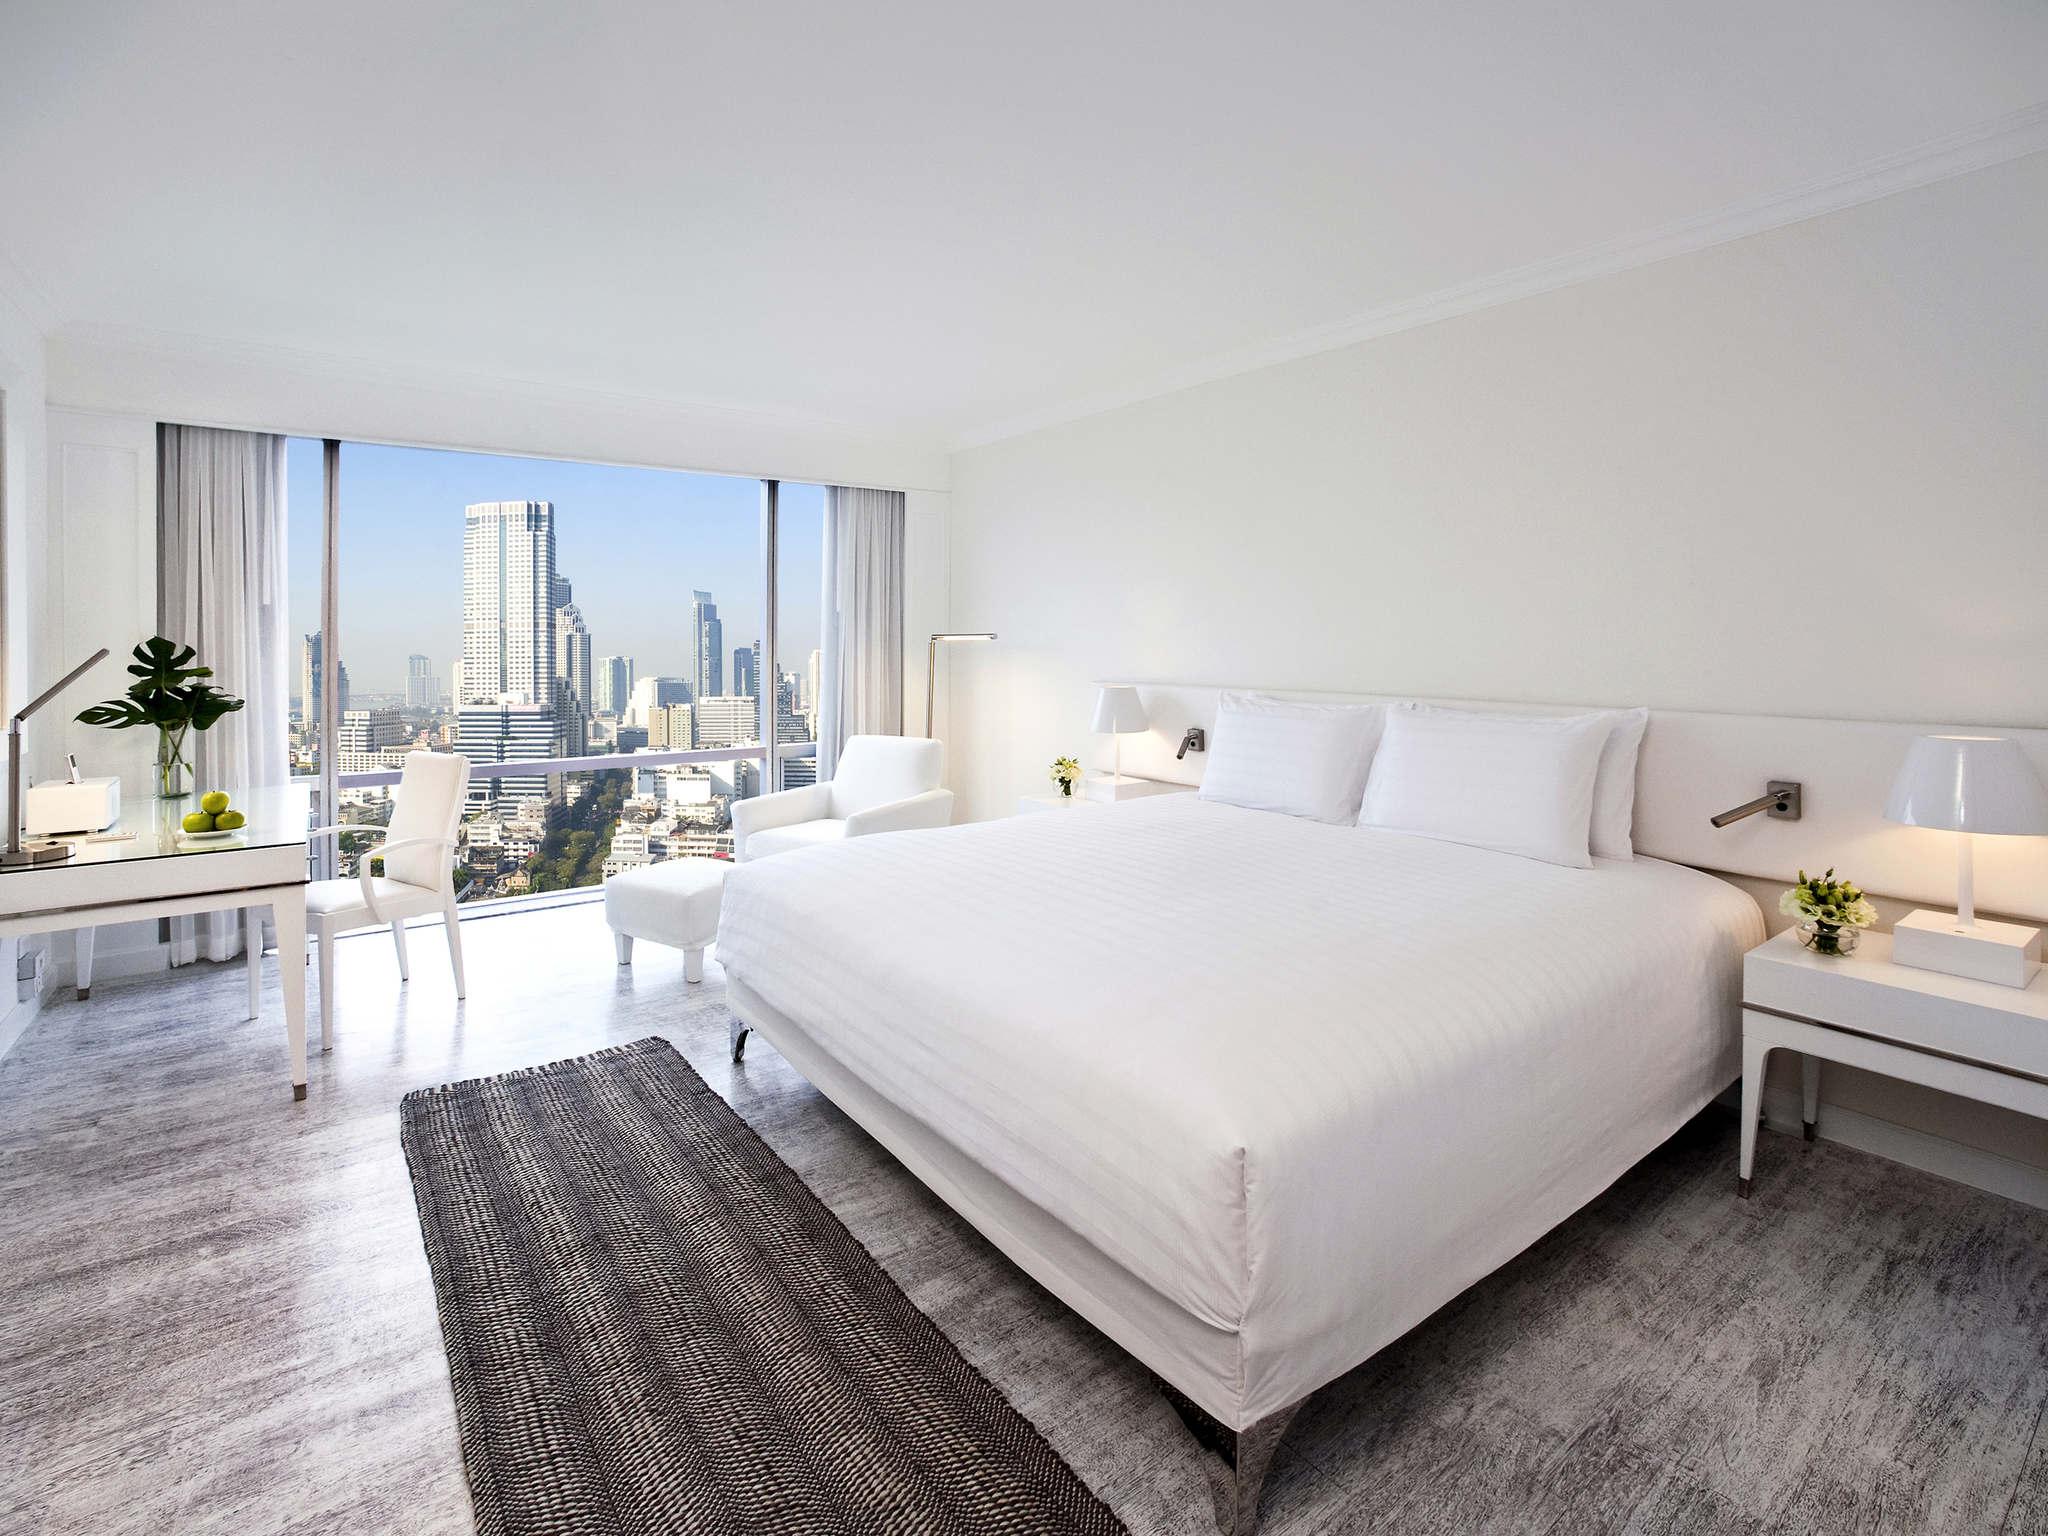 Design Hotel Bangkok - Pullman Bangkok Hotel G - Accorhotels